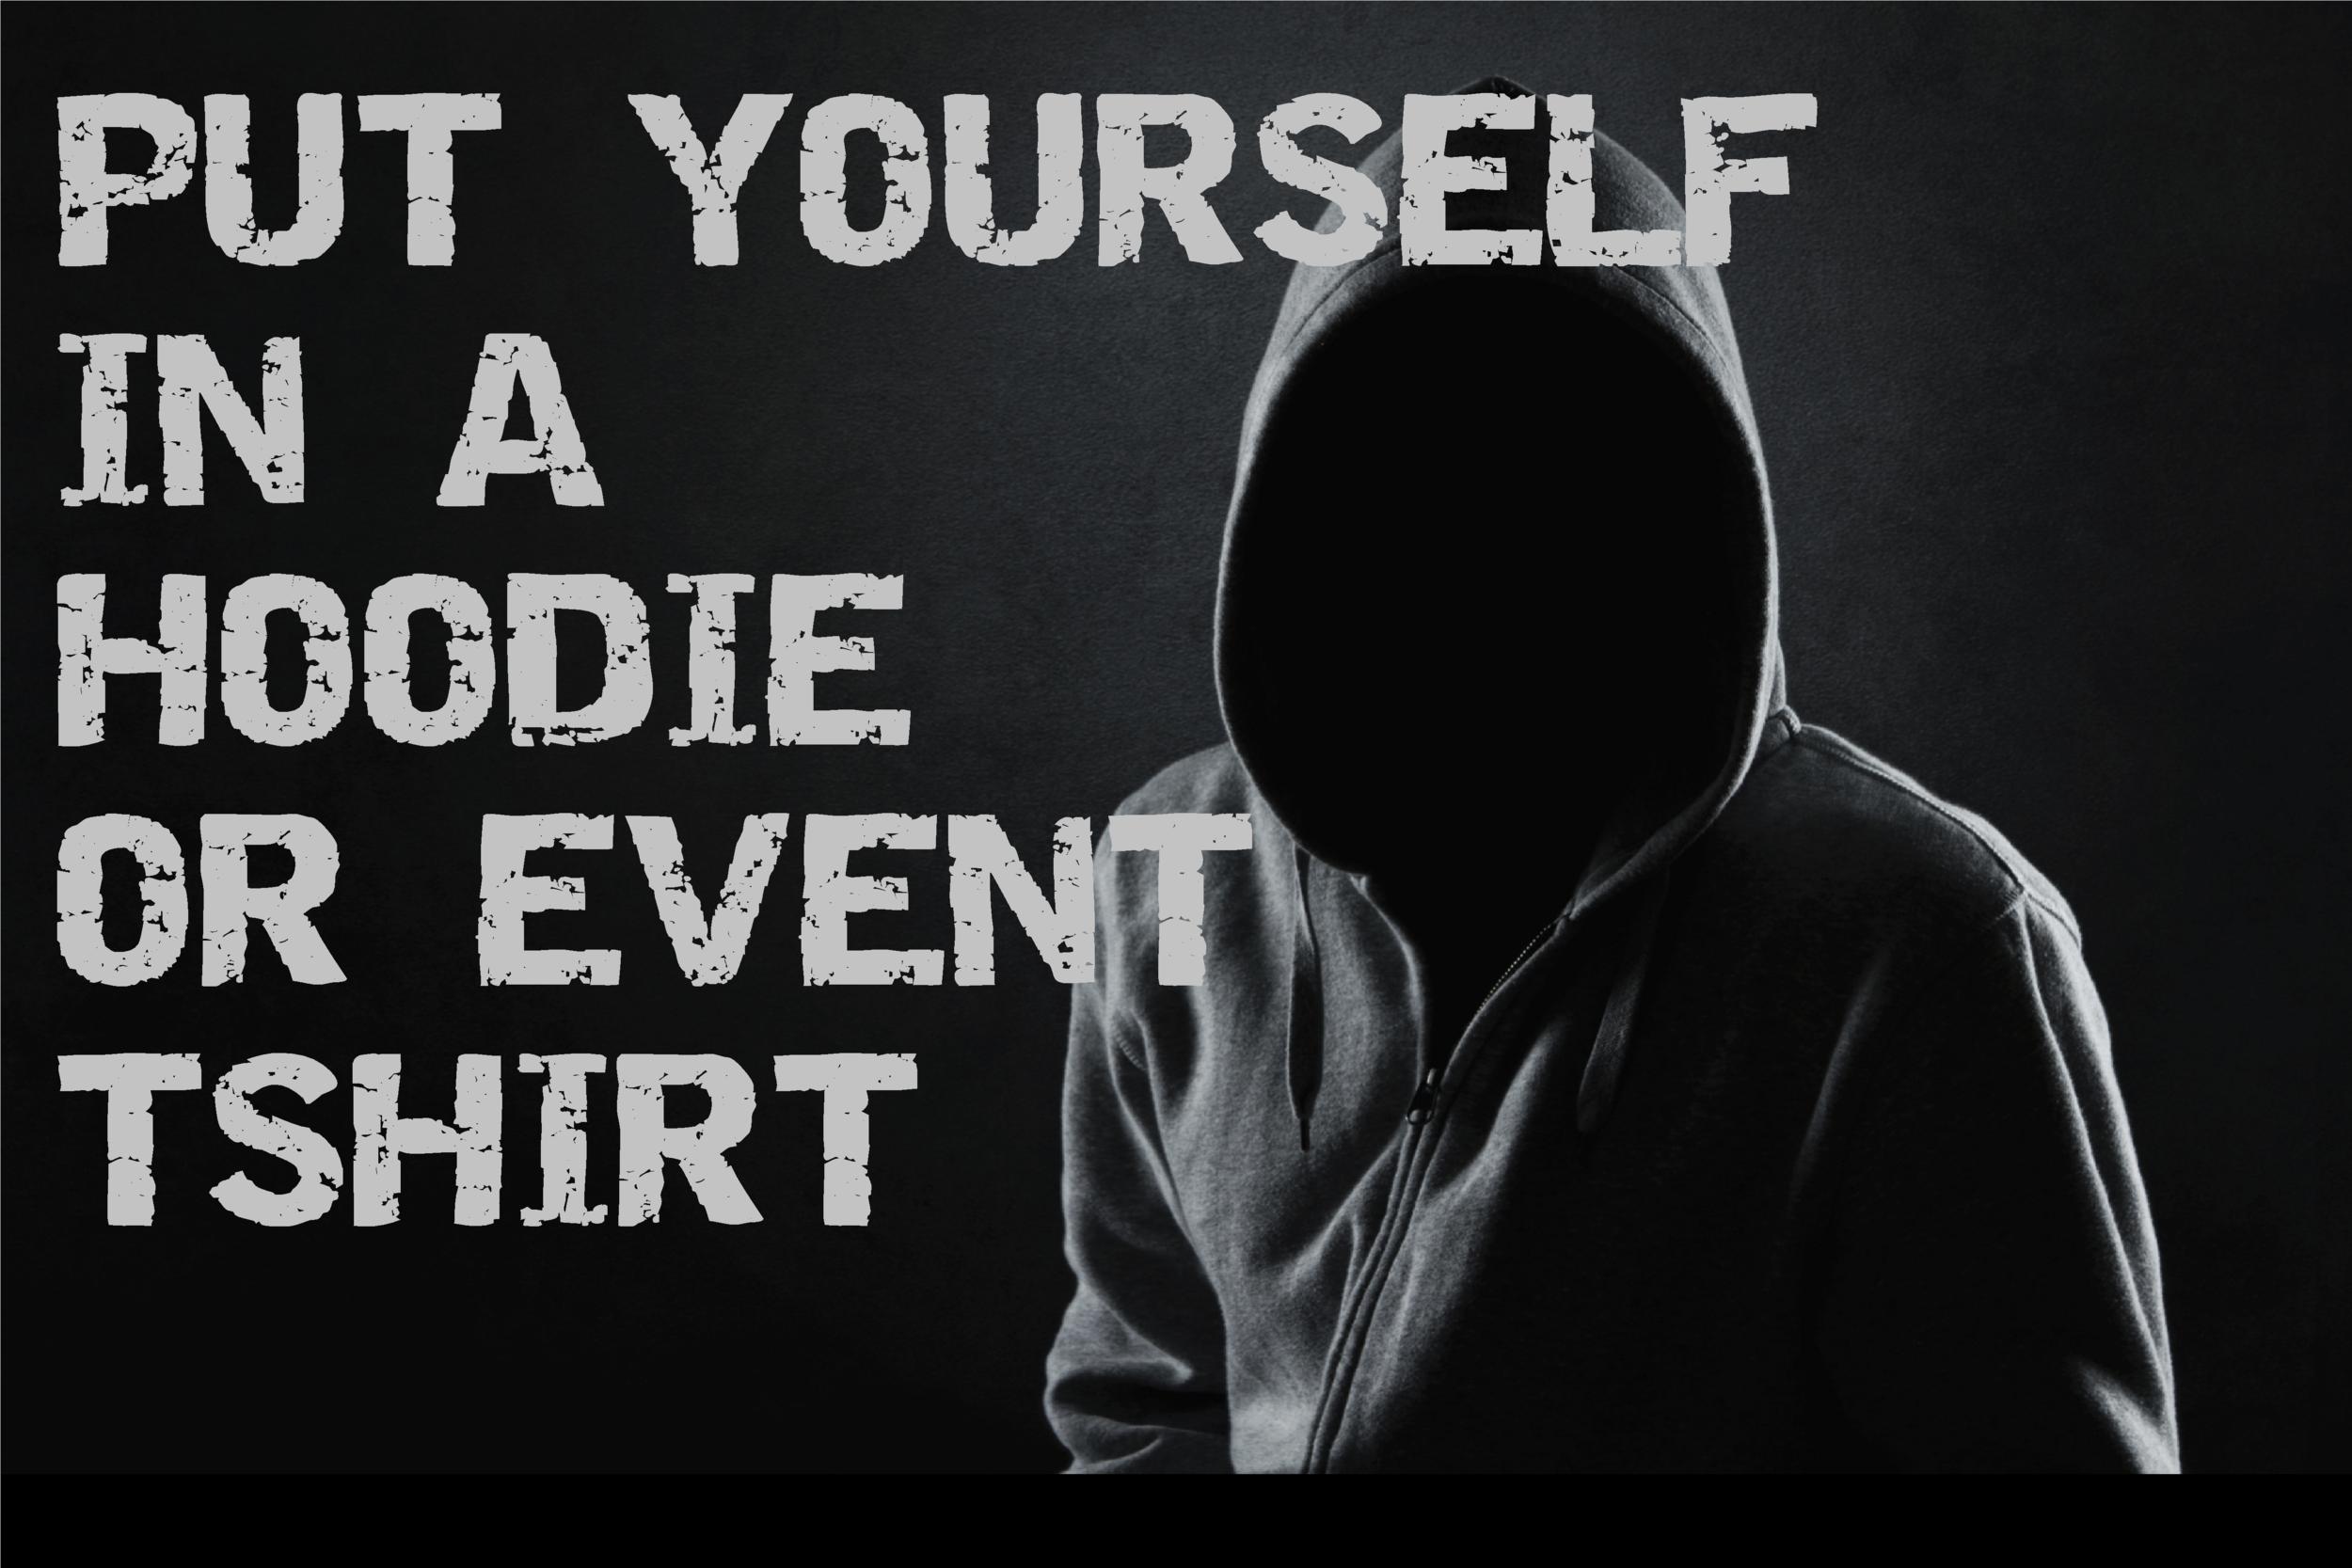 Shirts, Hoodies and more - 4th Floor - Texas Corridor Area